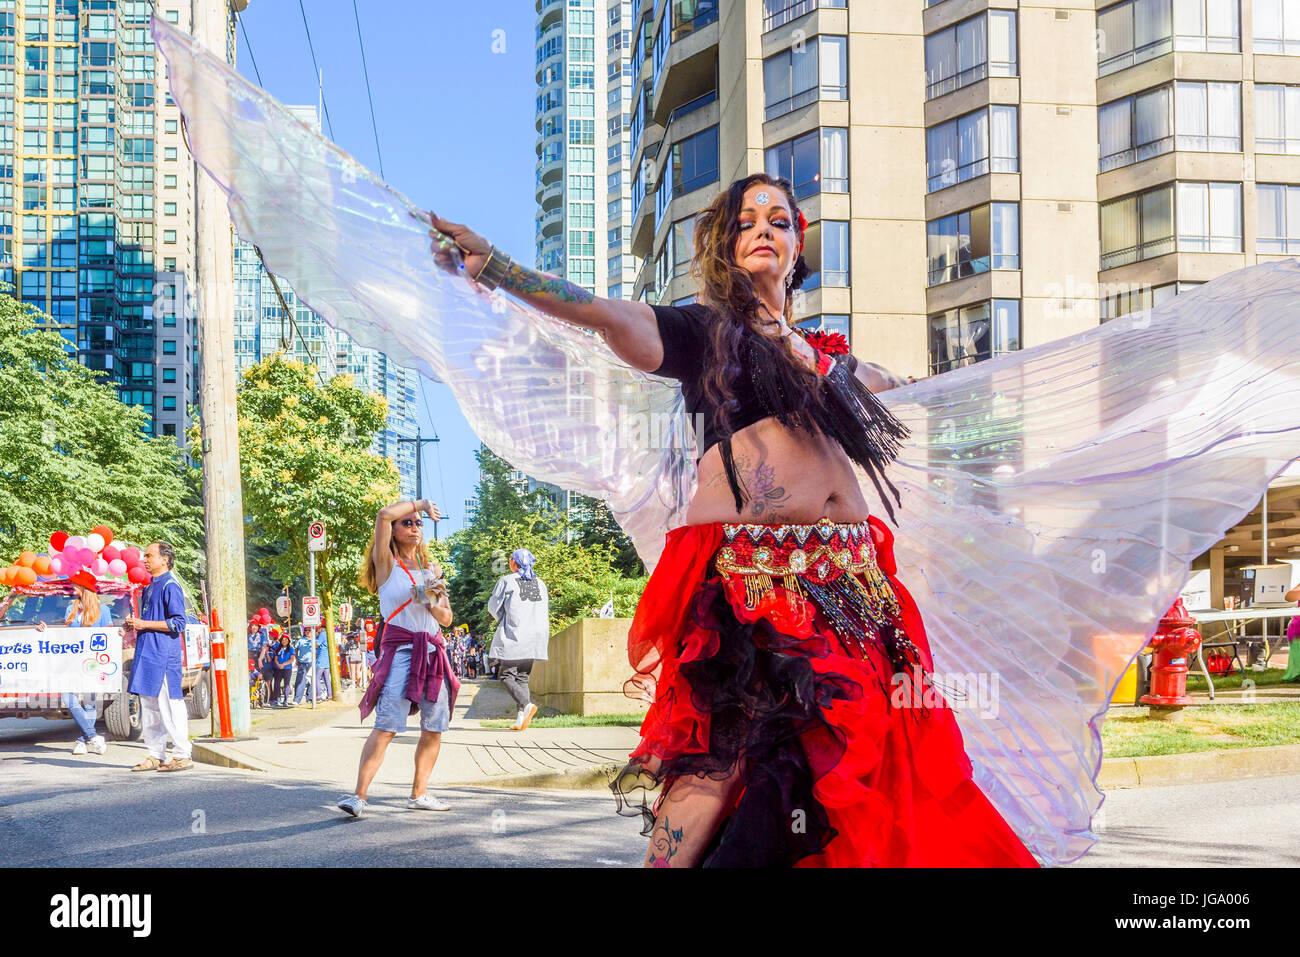 Canada 150, Canada Day Parade, Vancouver, British Columbia, Canada. - Stock Image